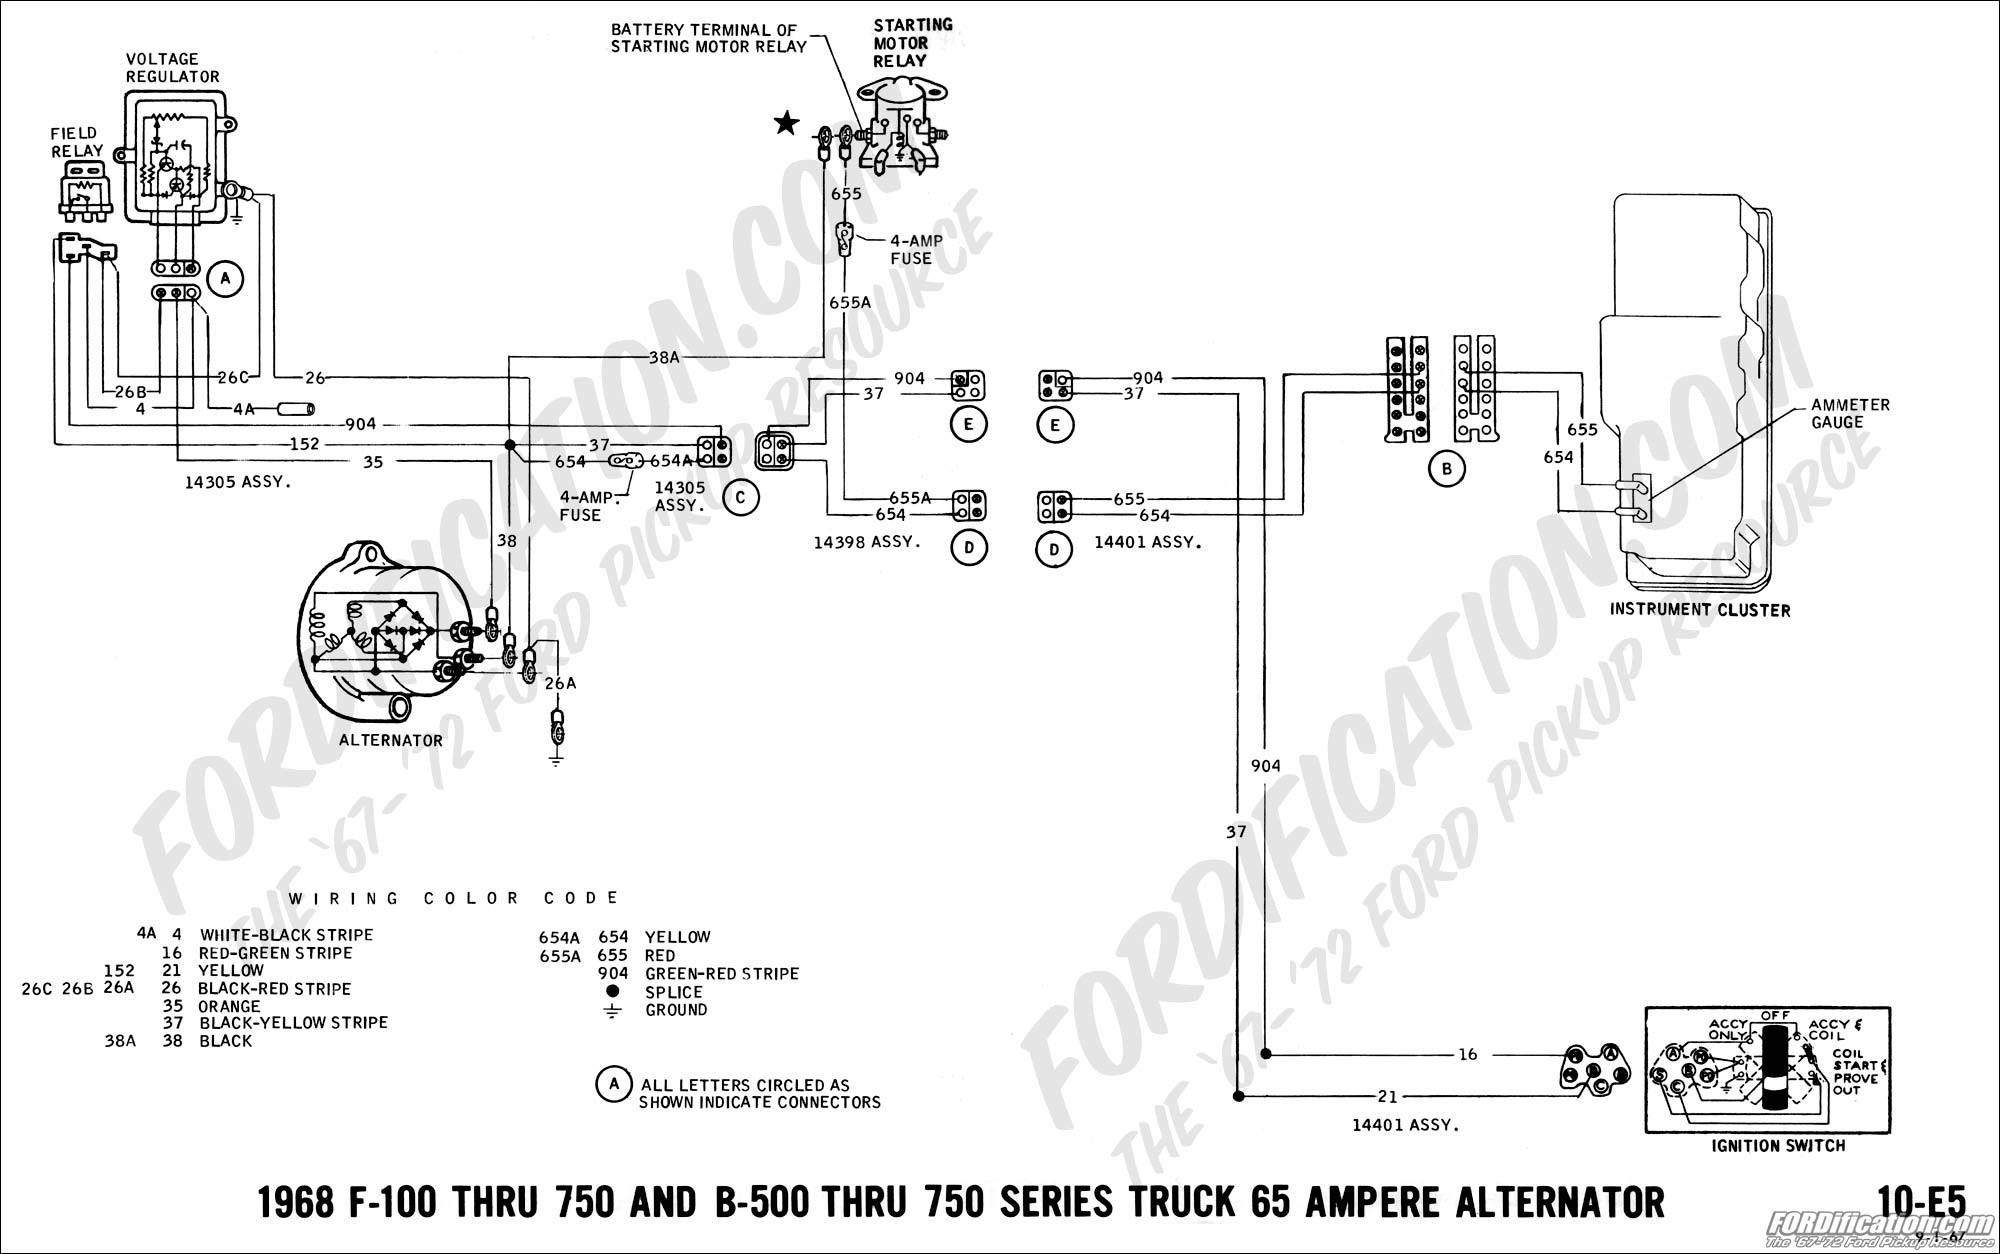 Harley Davidson Voltage Regulator Wiring Diagram